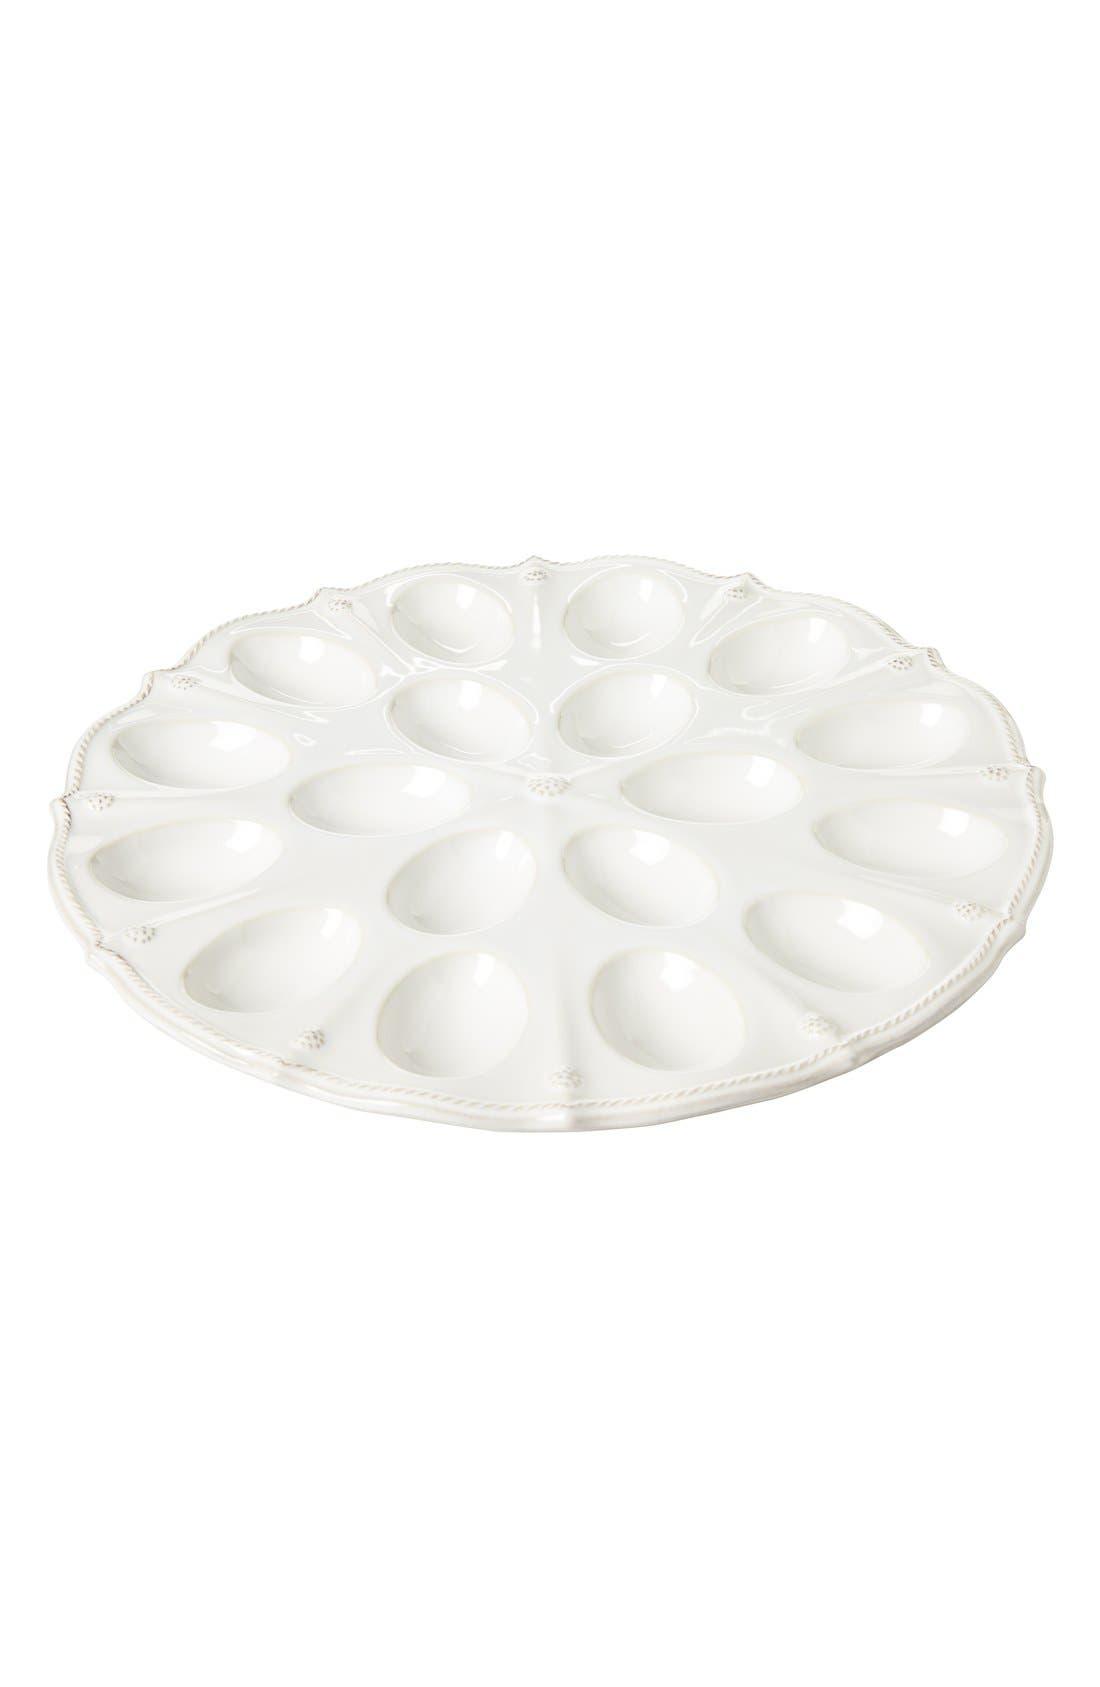 Main Image - Juliska 'Berry and Thread' Egg Platter